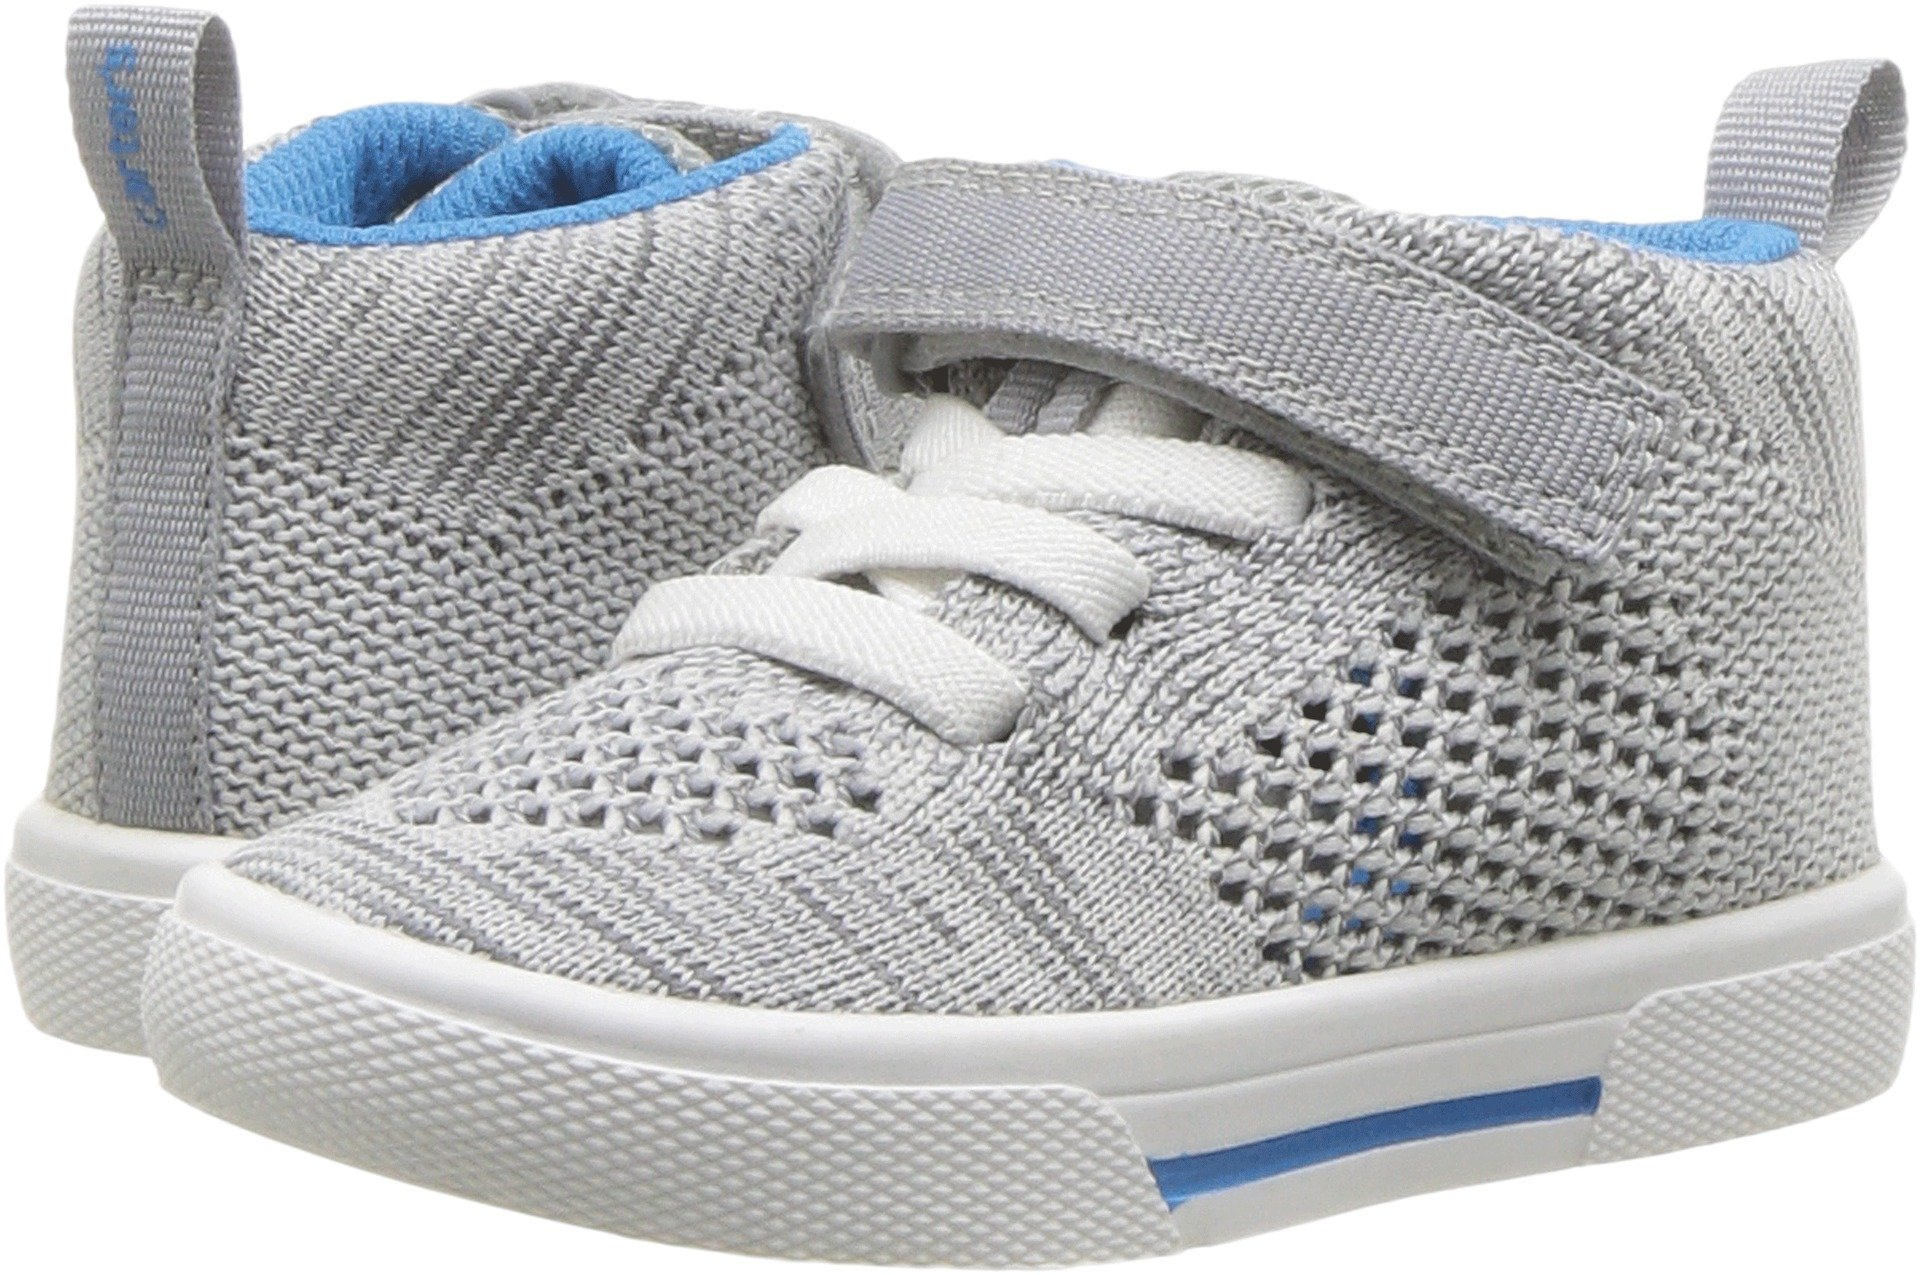 Carter's Boys' Knight High-Top Sneaker, Grey, 7 M US Toddler